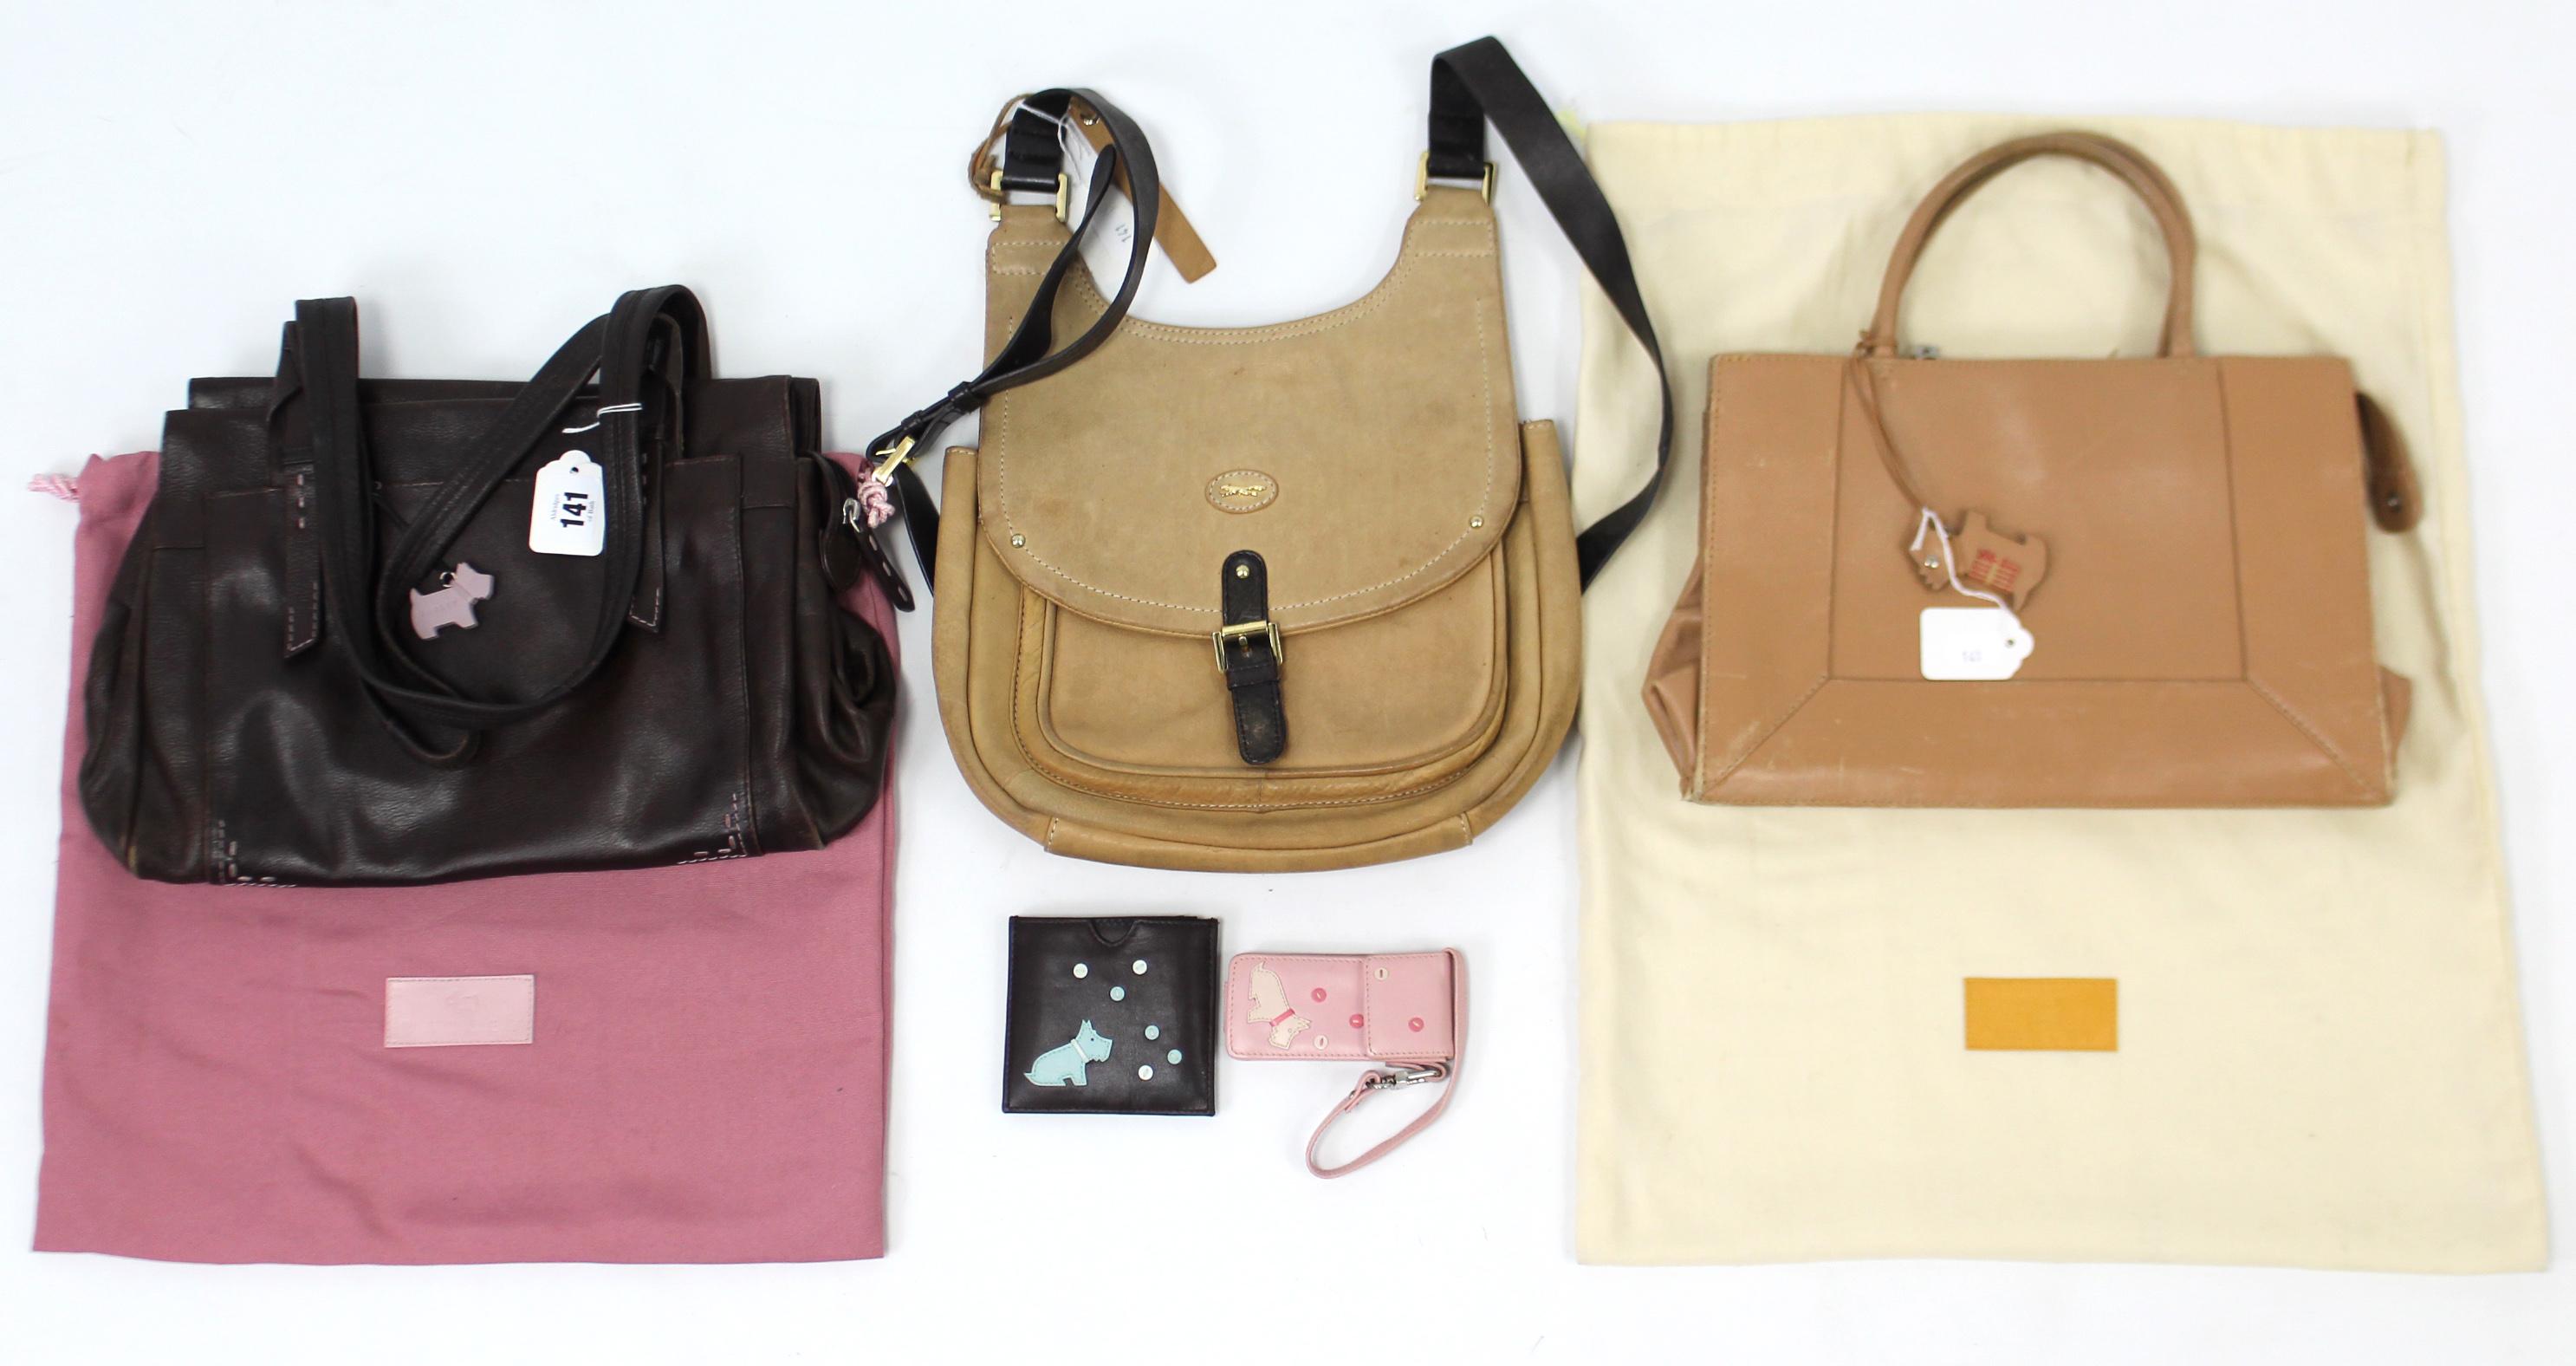 Lot 141 - A Paul Costelloe tan leather ladies' handbag; & two Radley ladies' handbags.